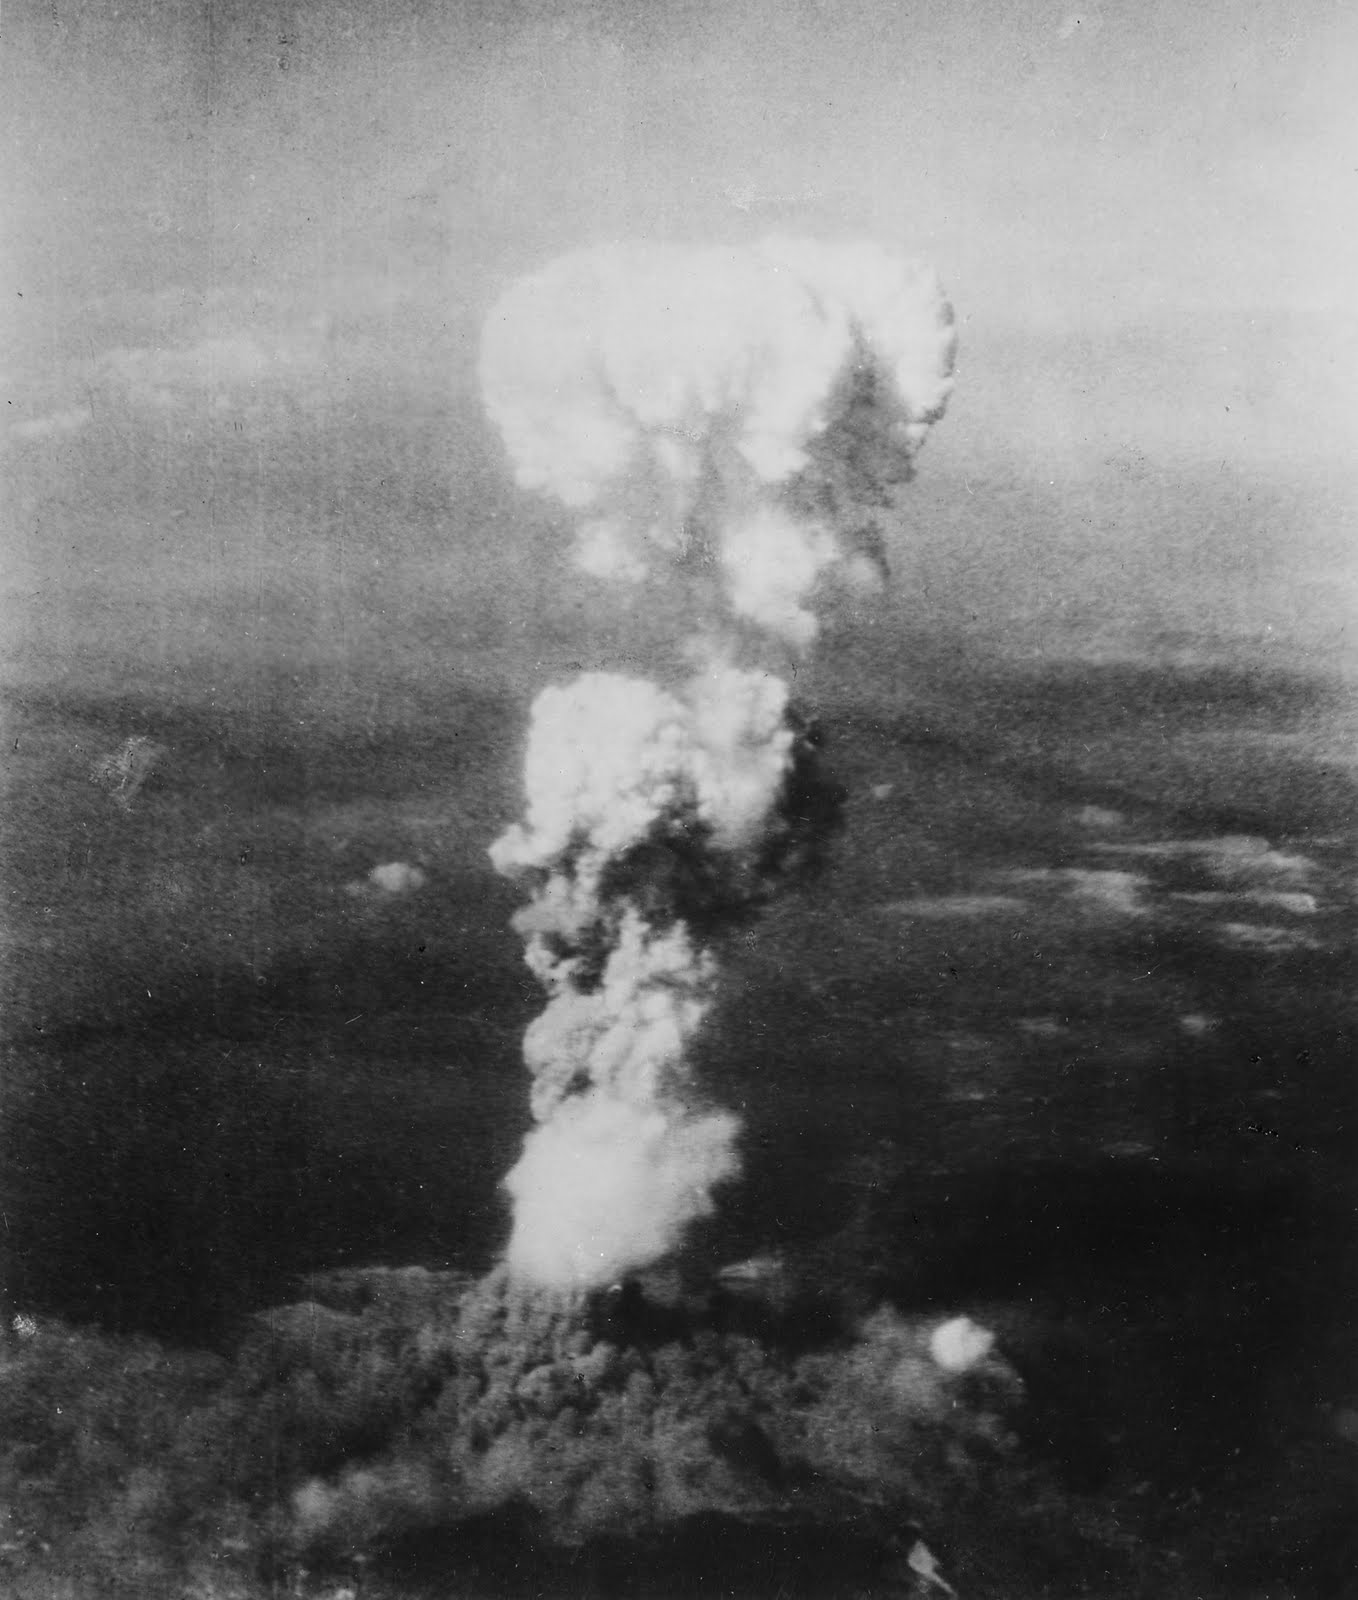 japan surrendered six days